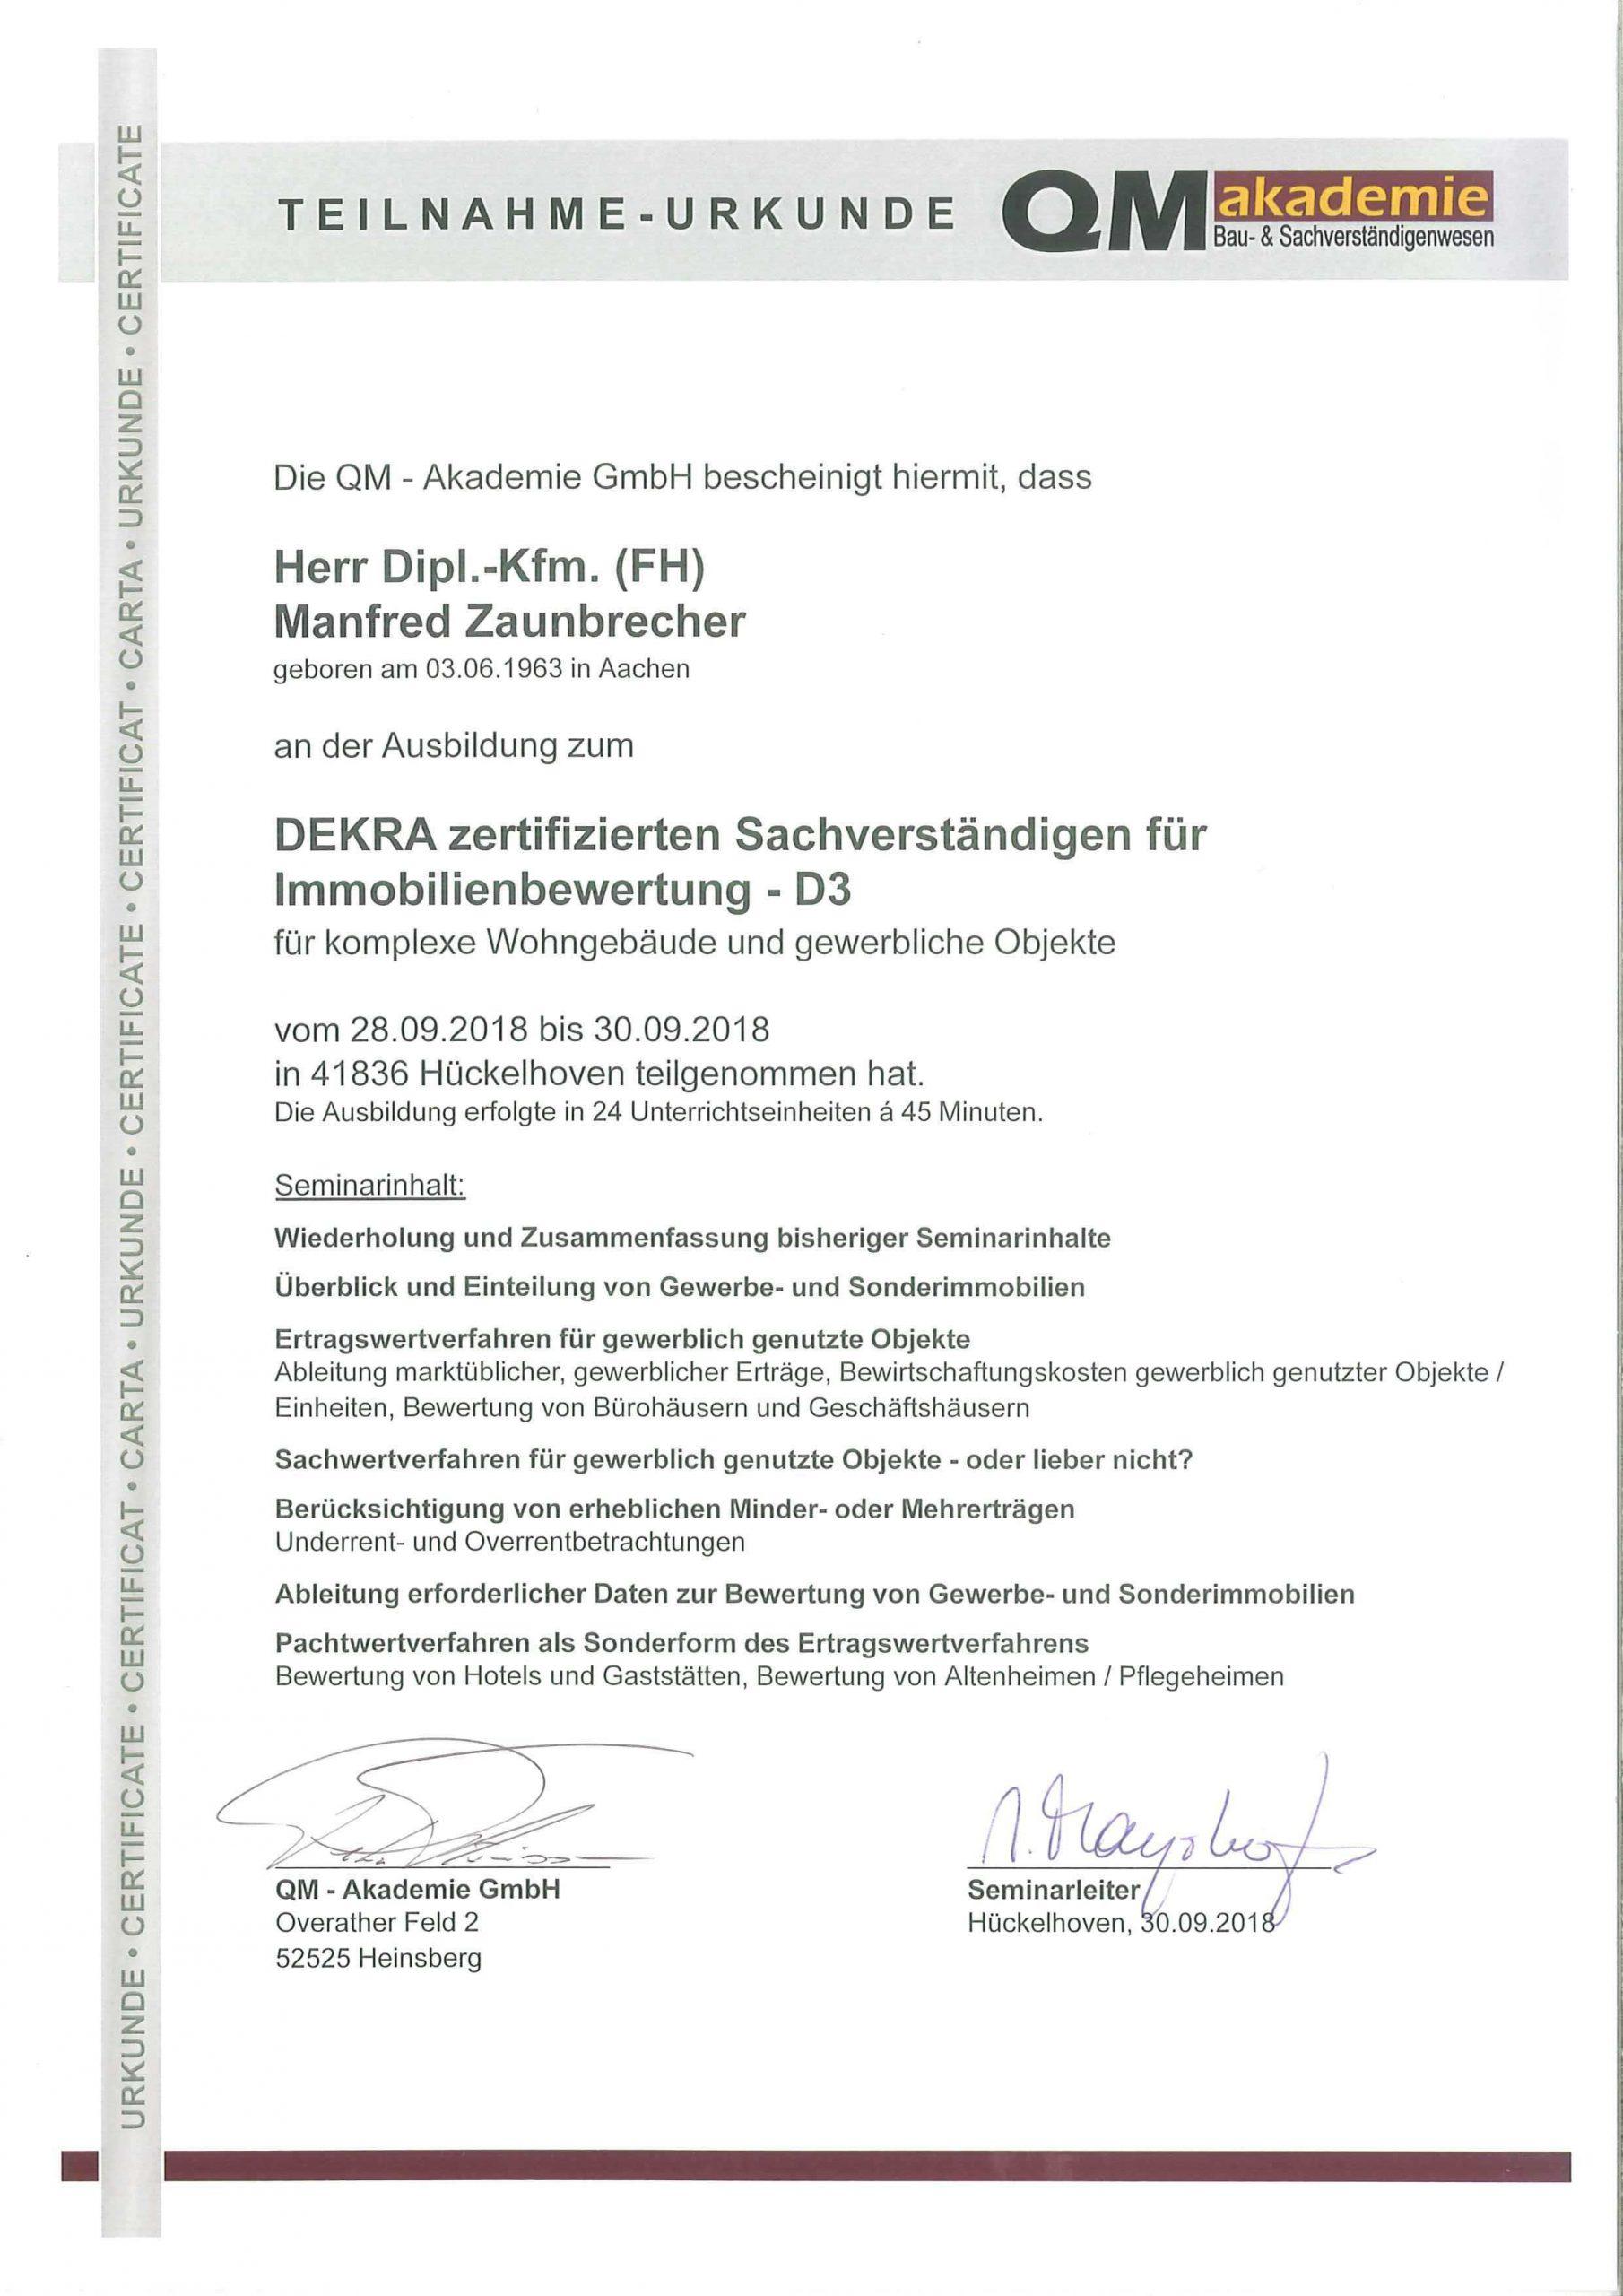 Urkunde QM Akademie